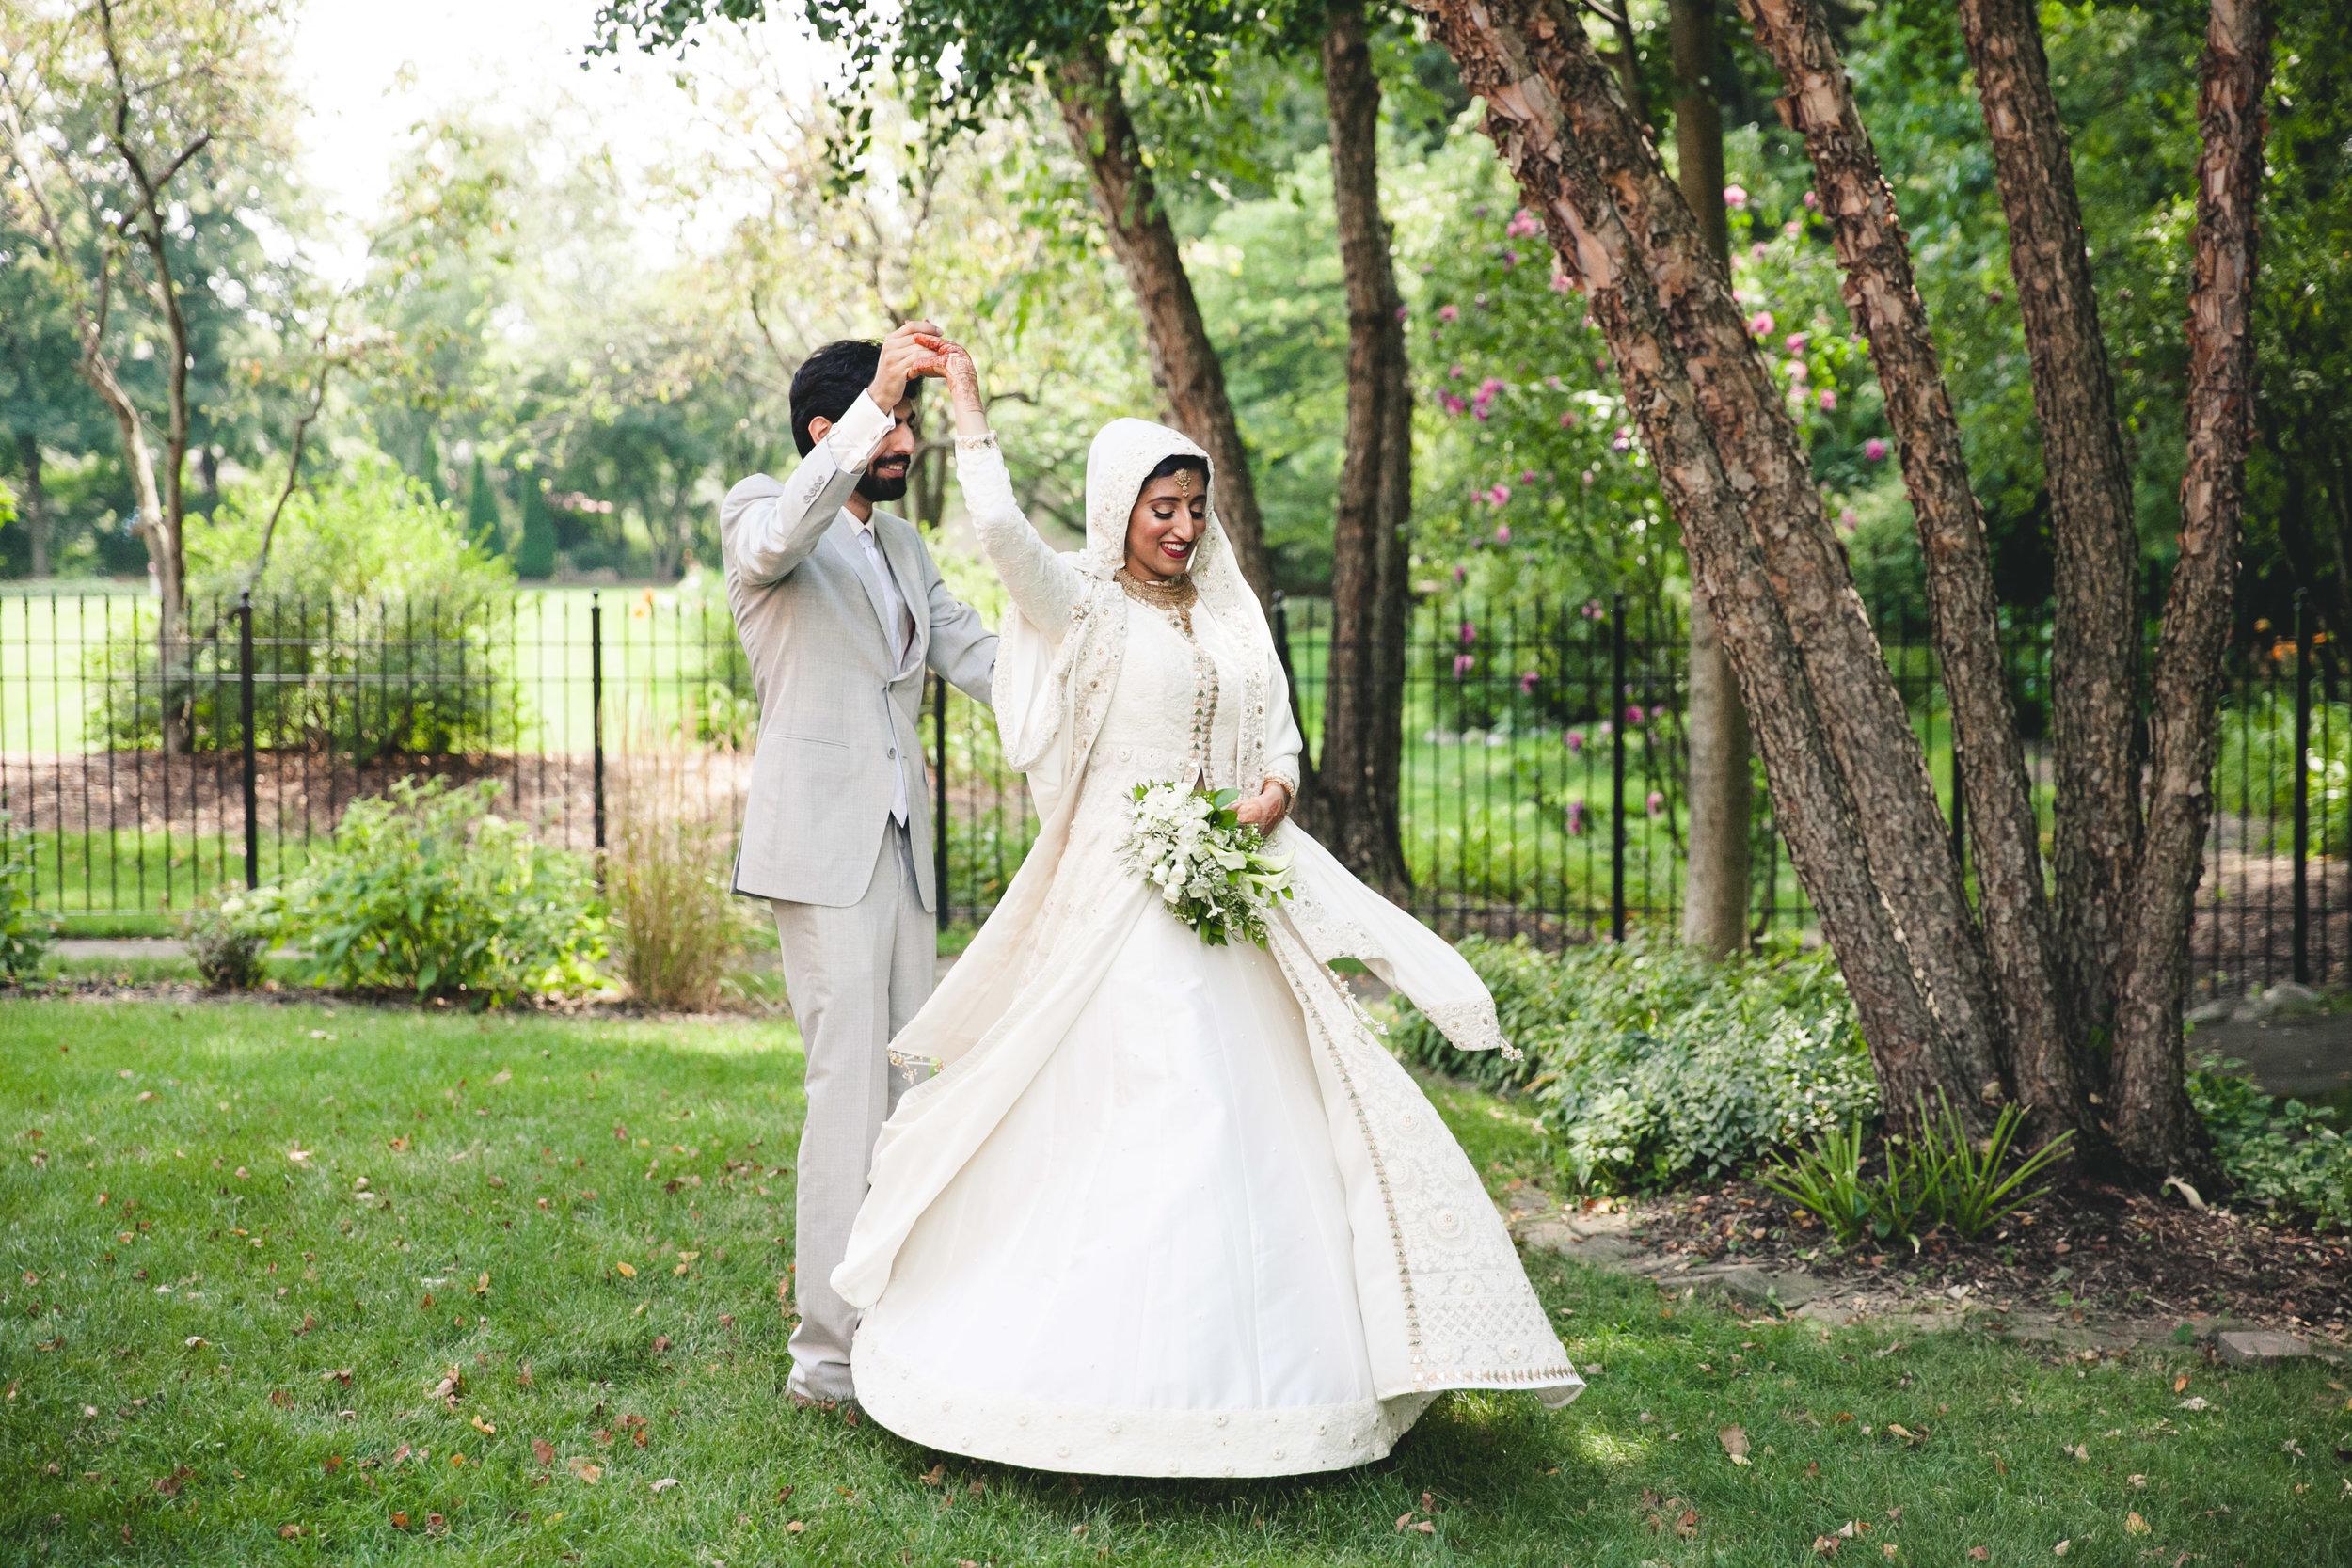 LisaDiederichPhotography_Maryam&Salman-105.jpg